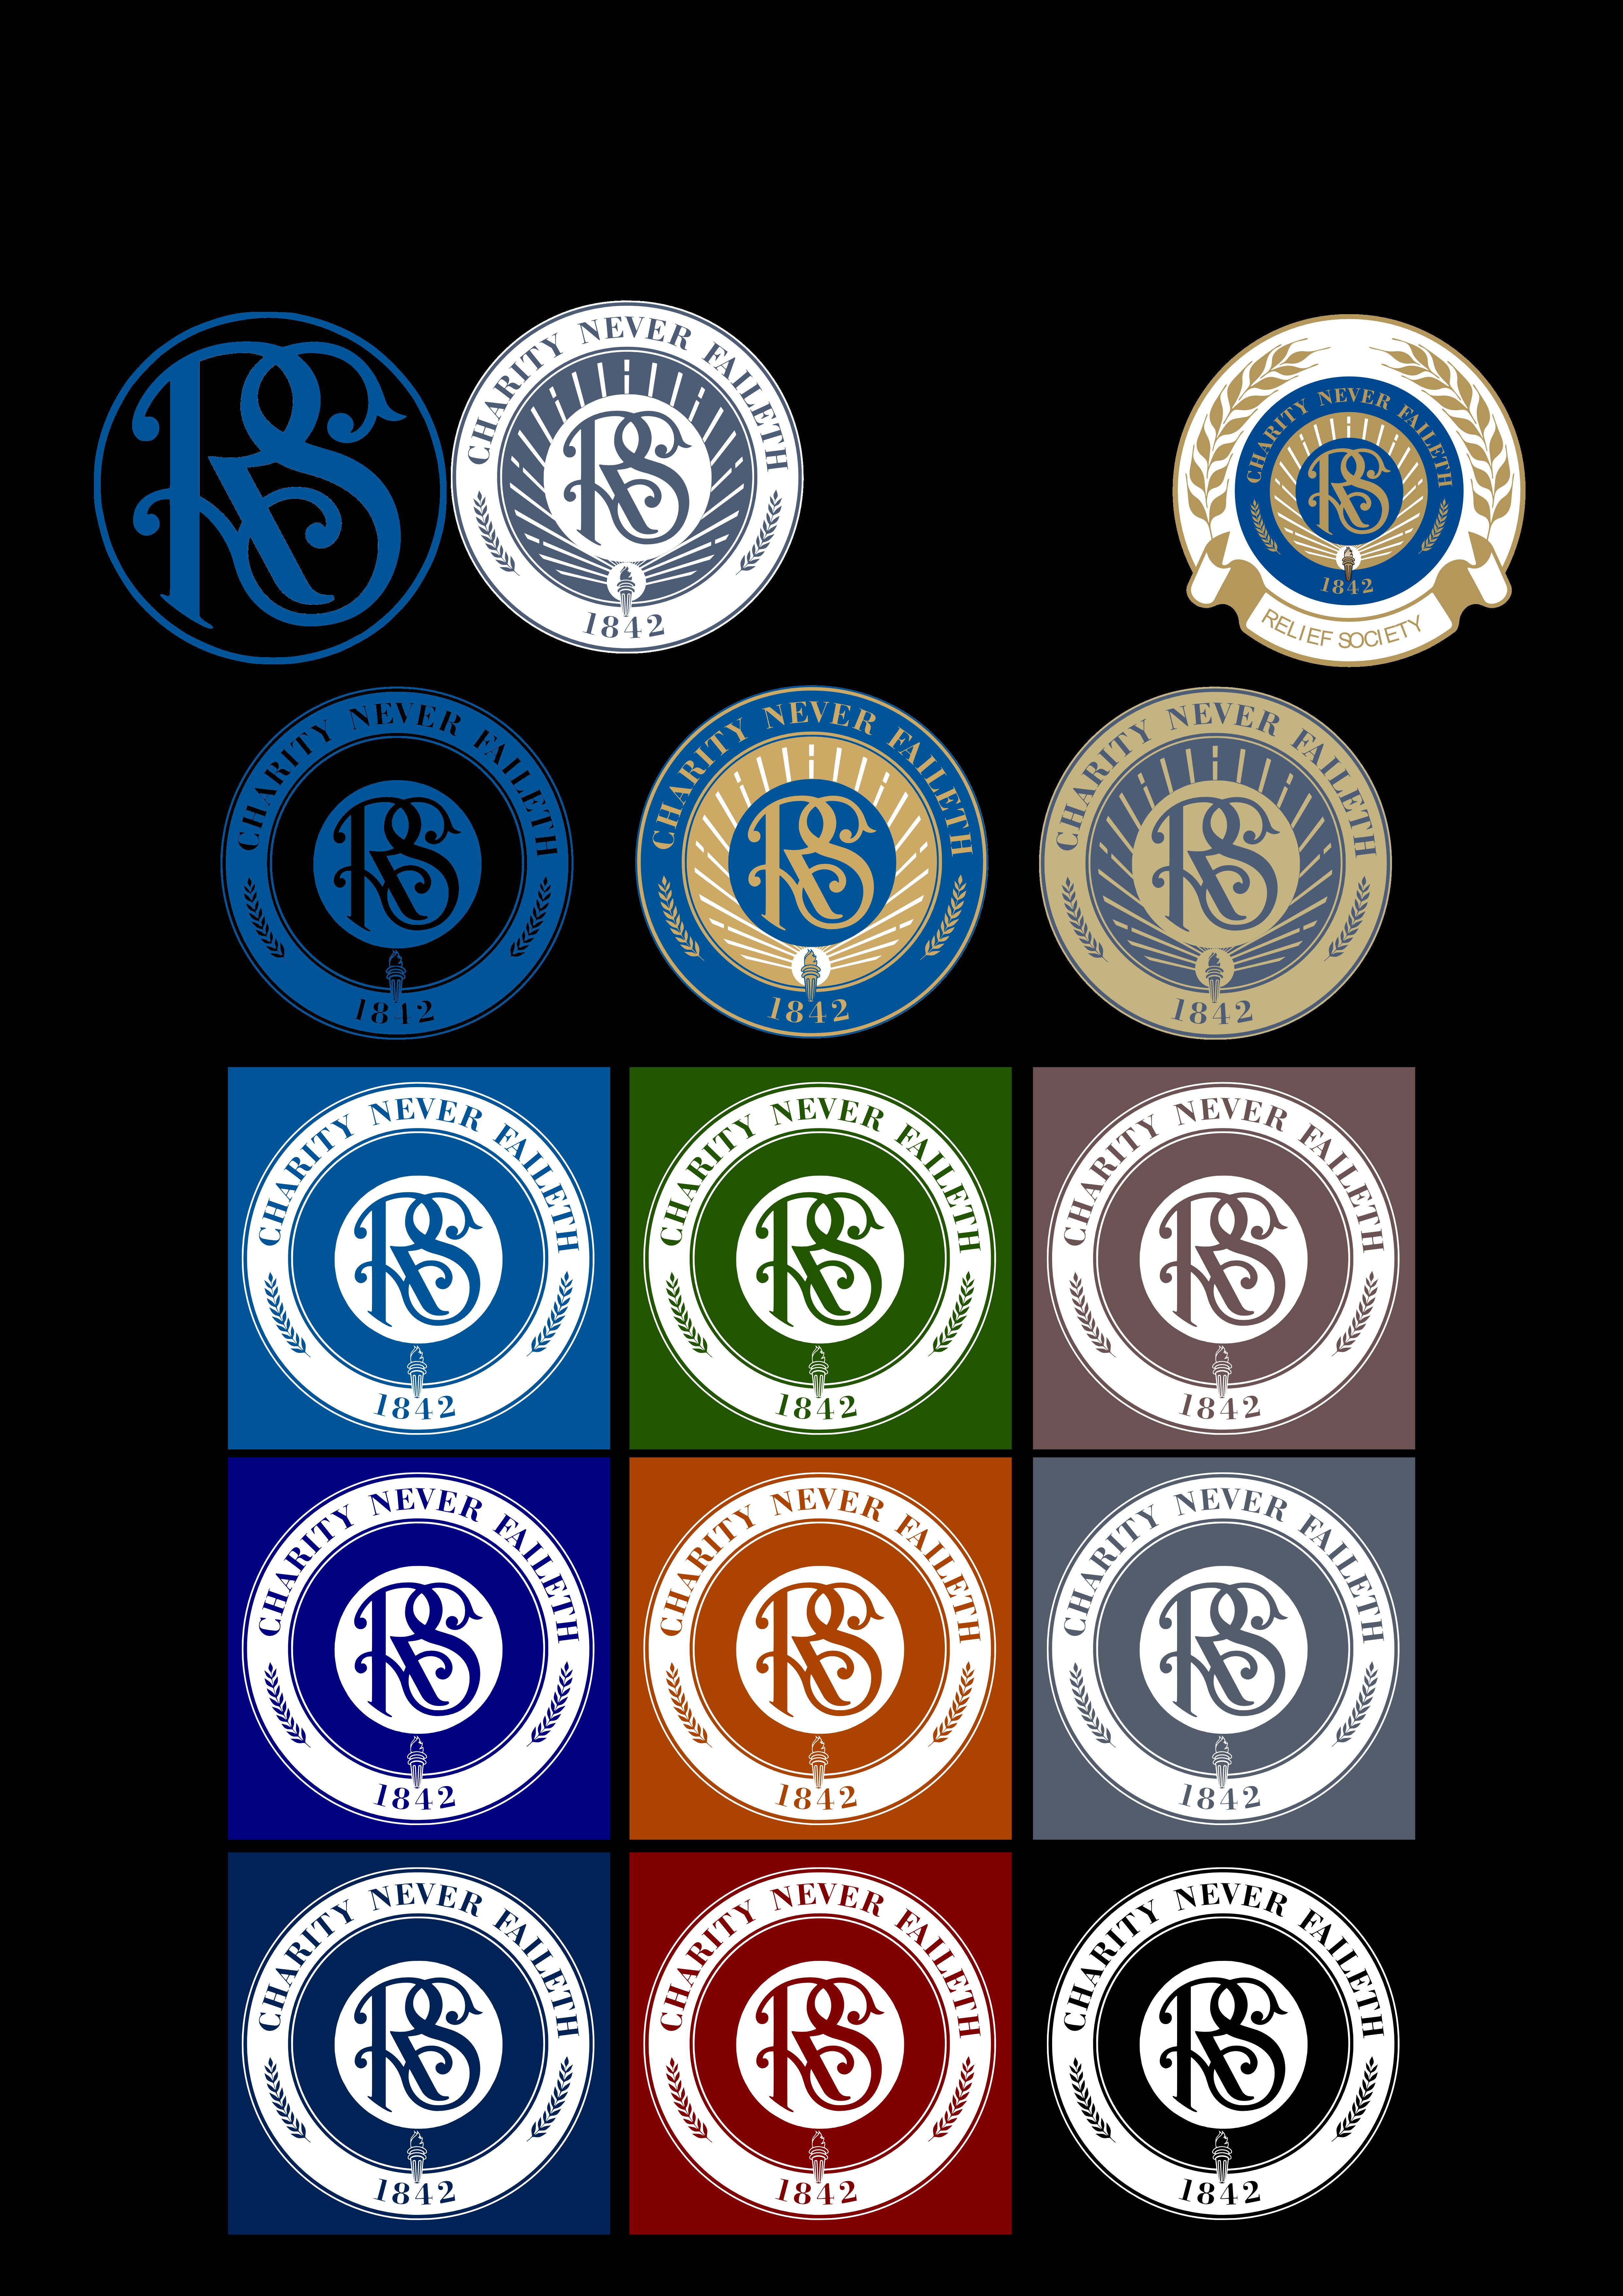 relief society logos clipart rh sugardoodle net Relief Society Clip Art Small Relief Society Clip Art Small